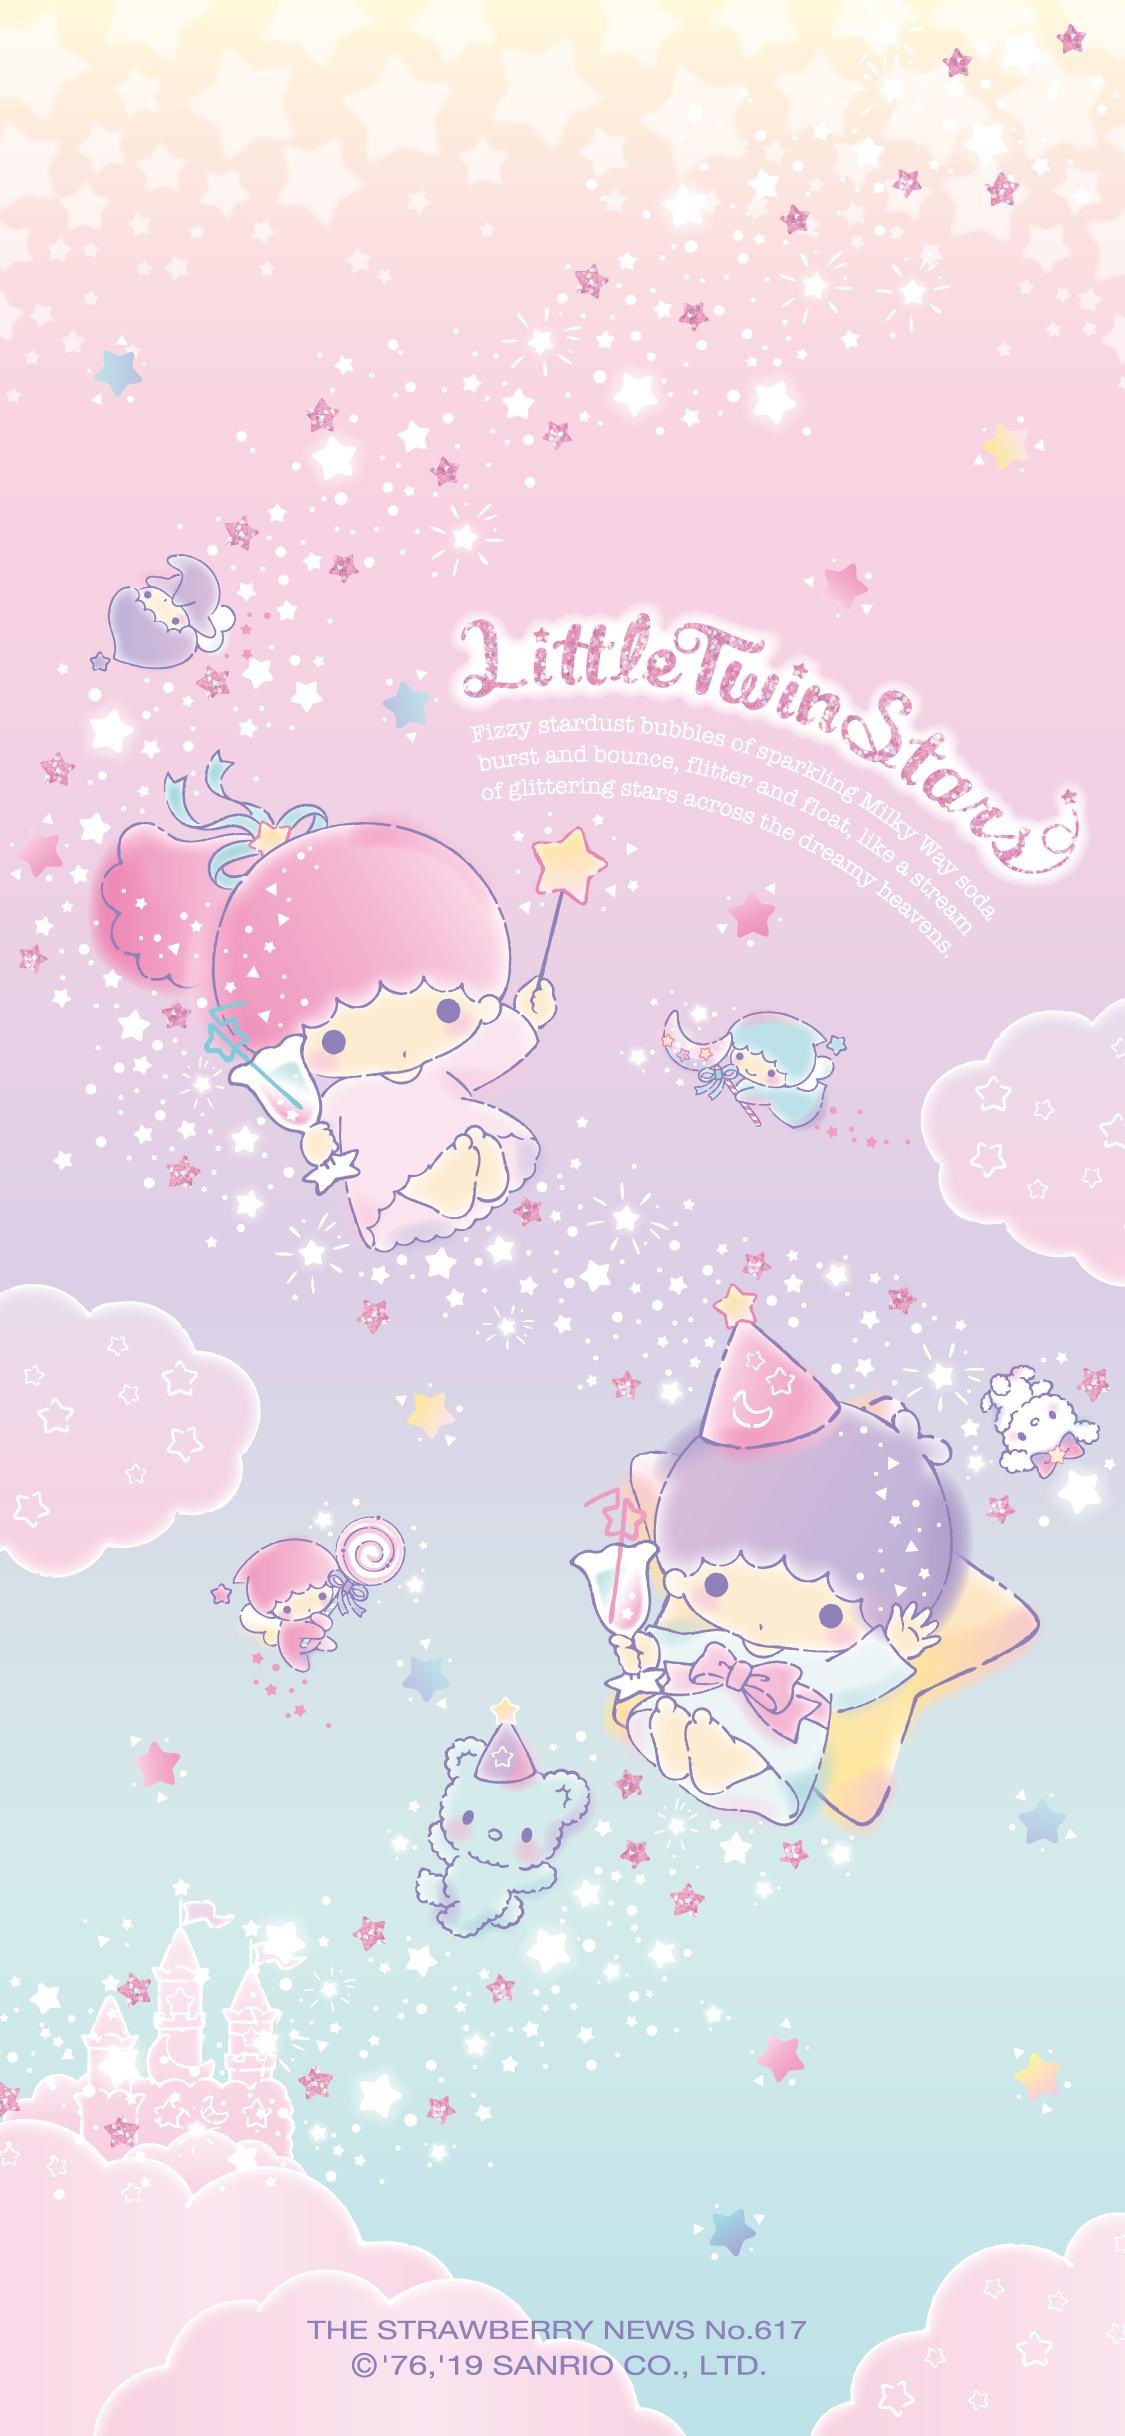 Little Twin Stars Wallpaper Iphone - HD Wallpaper